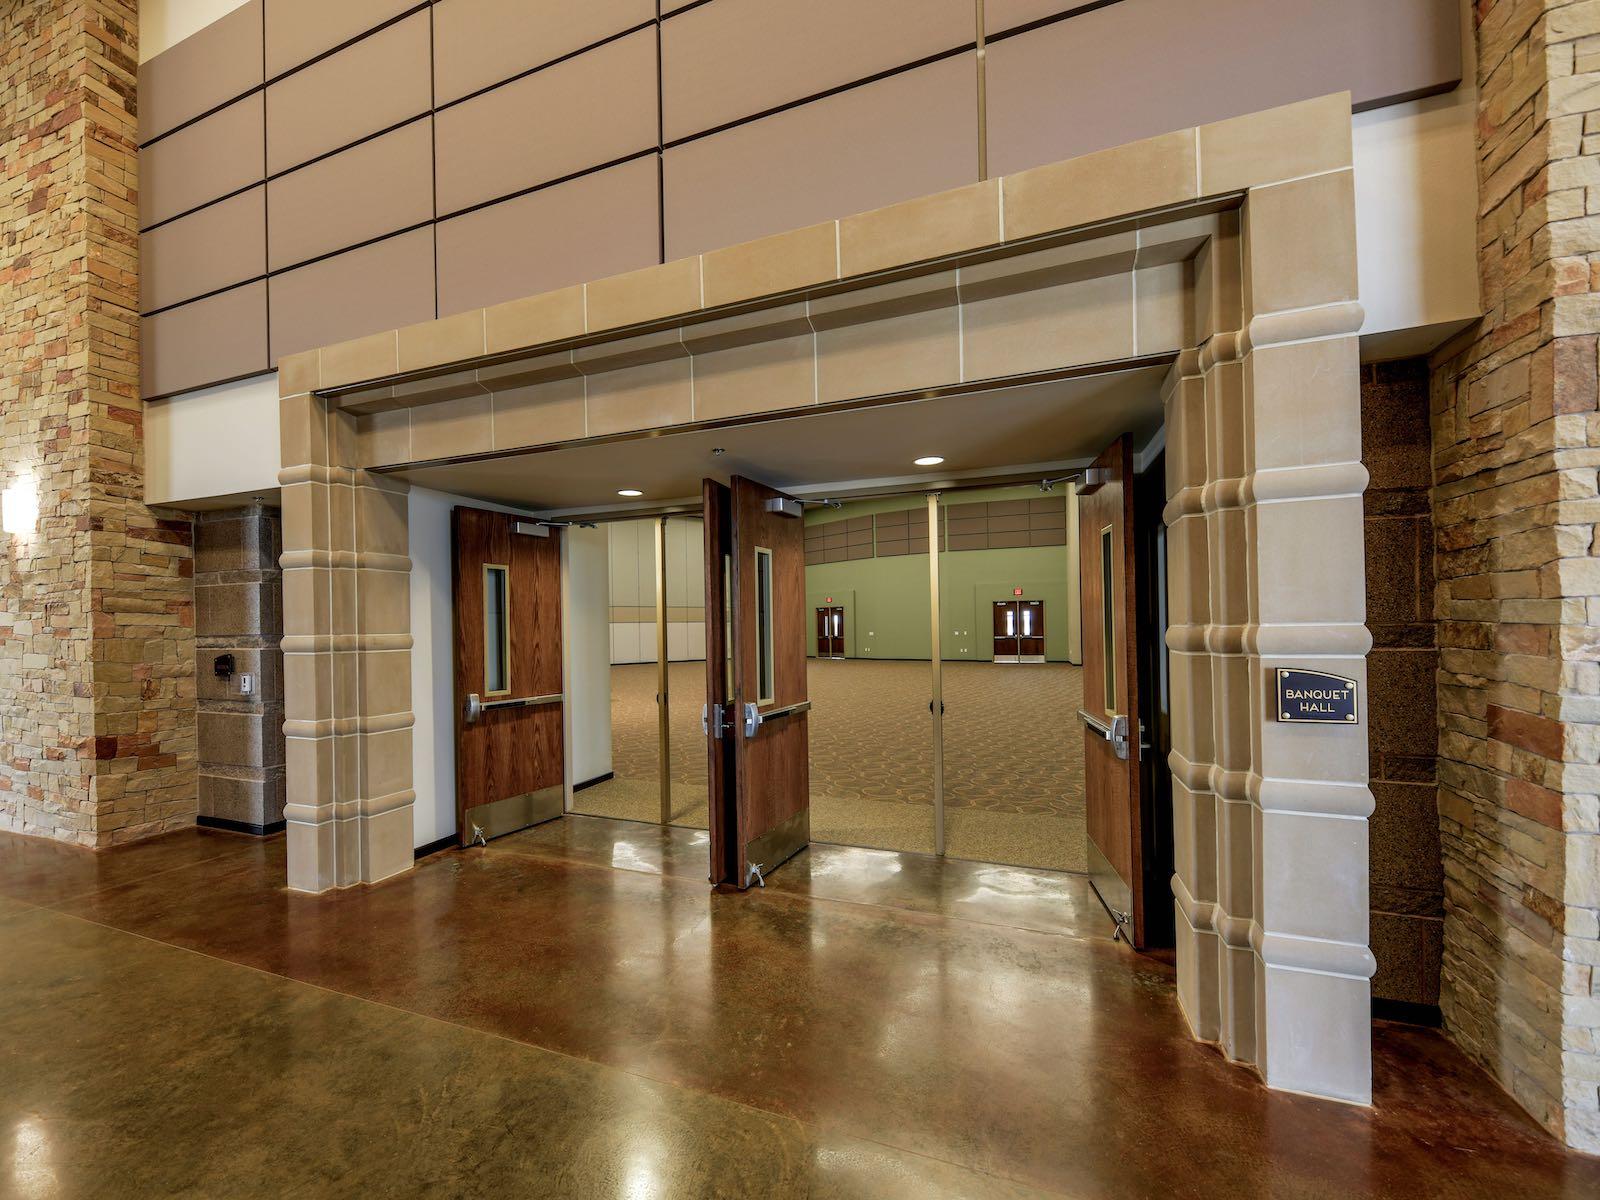 Interior Entryway Surround Trim - Cast Stone, GFRC